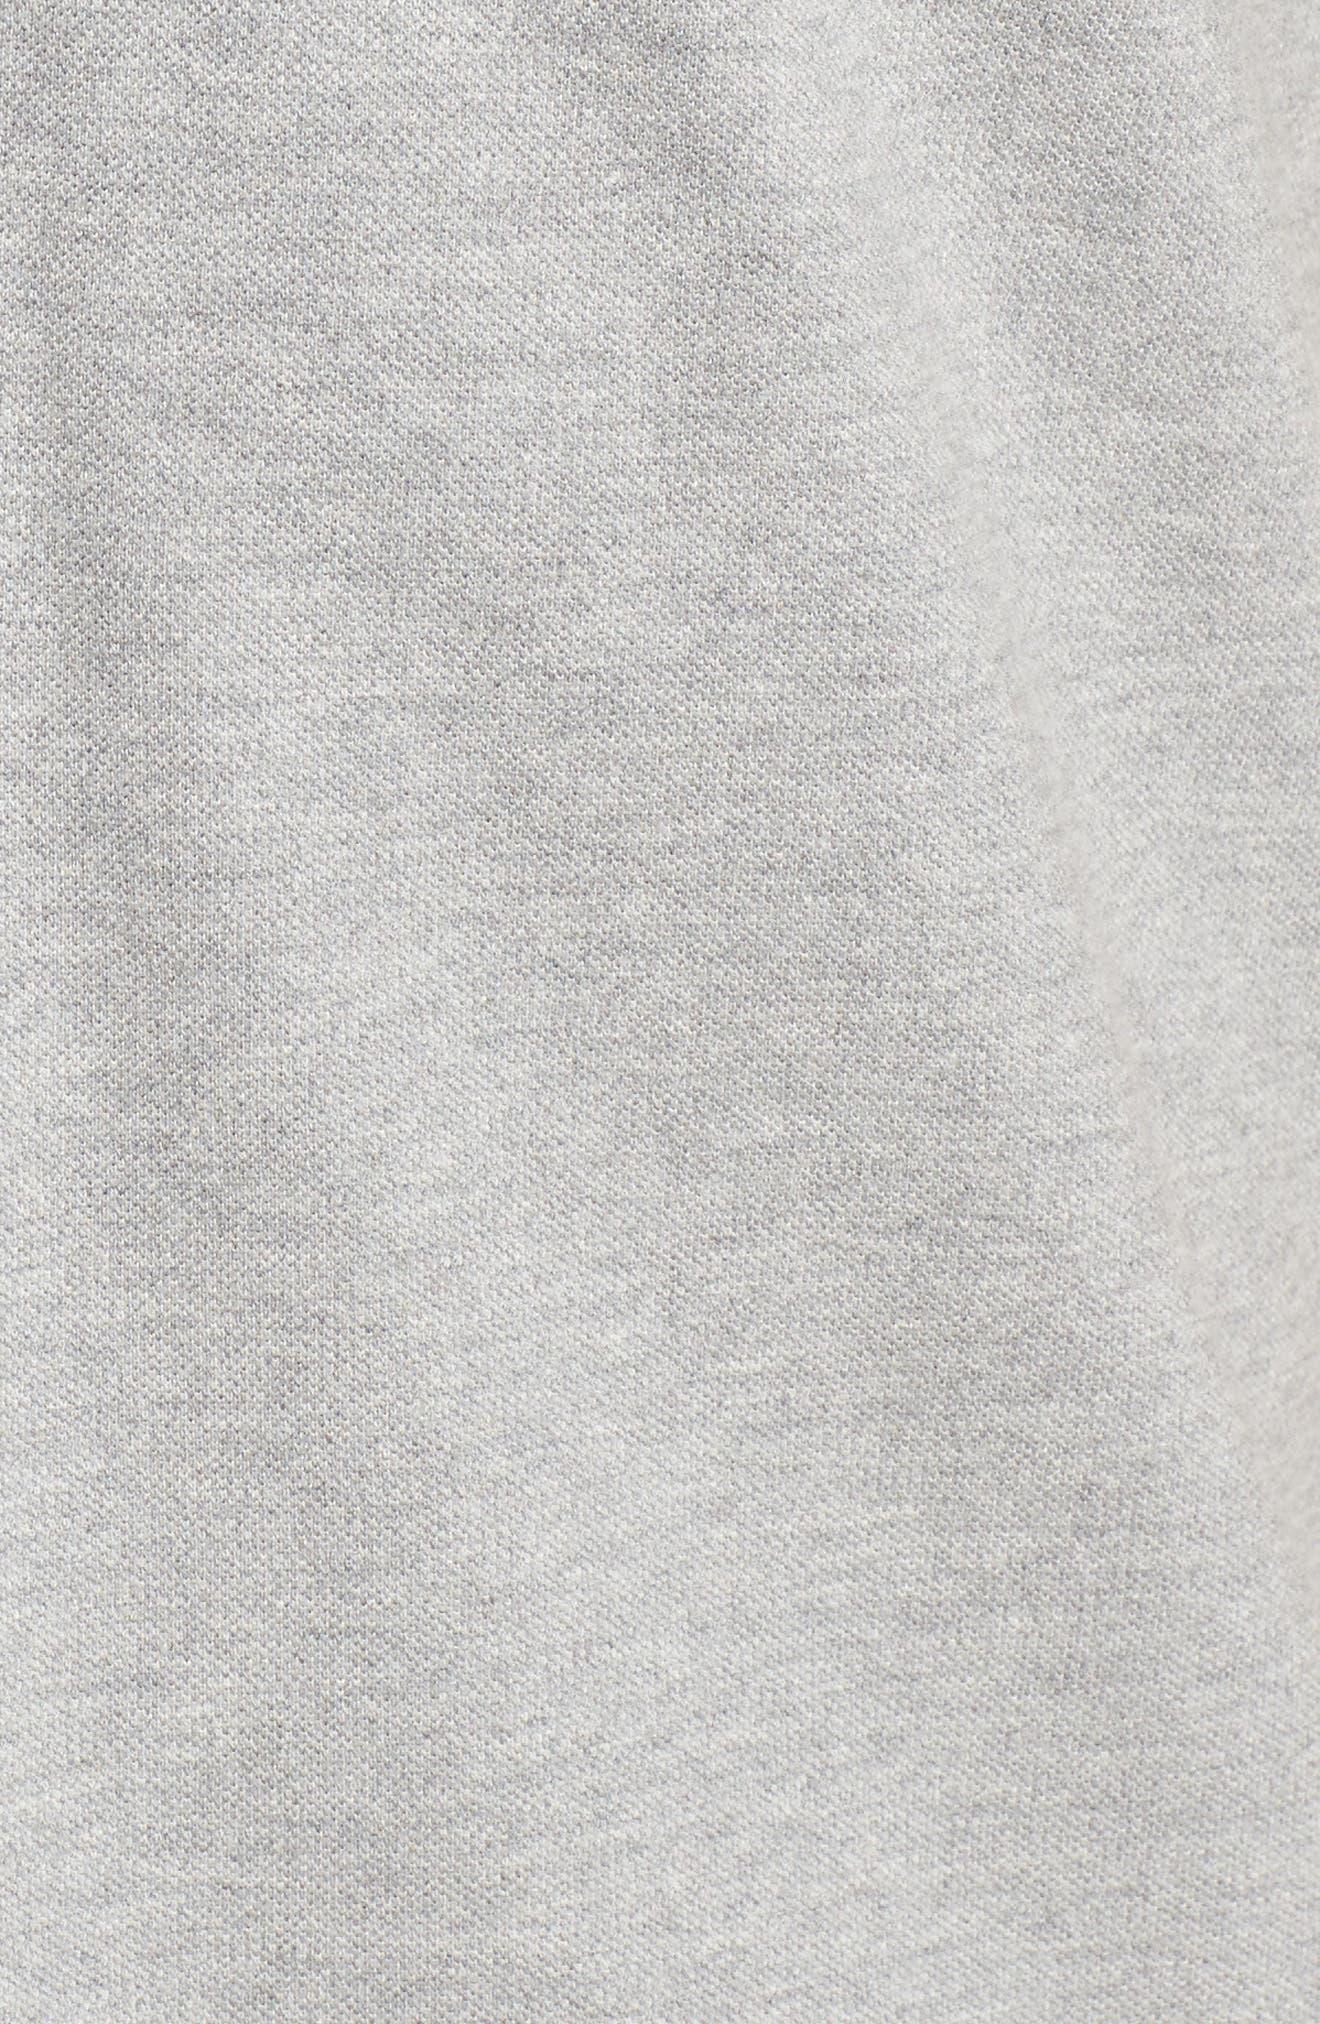 Pierro Piqué Polo,                             Alternate thumbnail 5, color,                             020